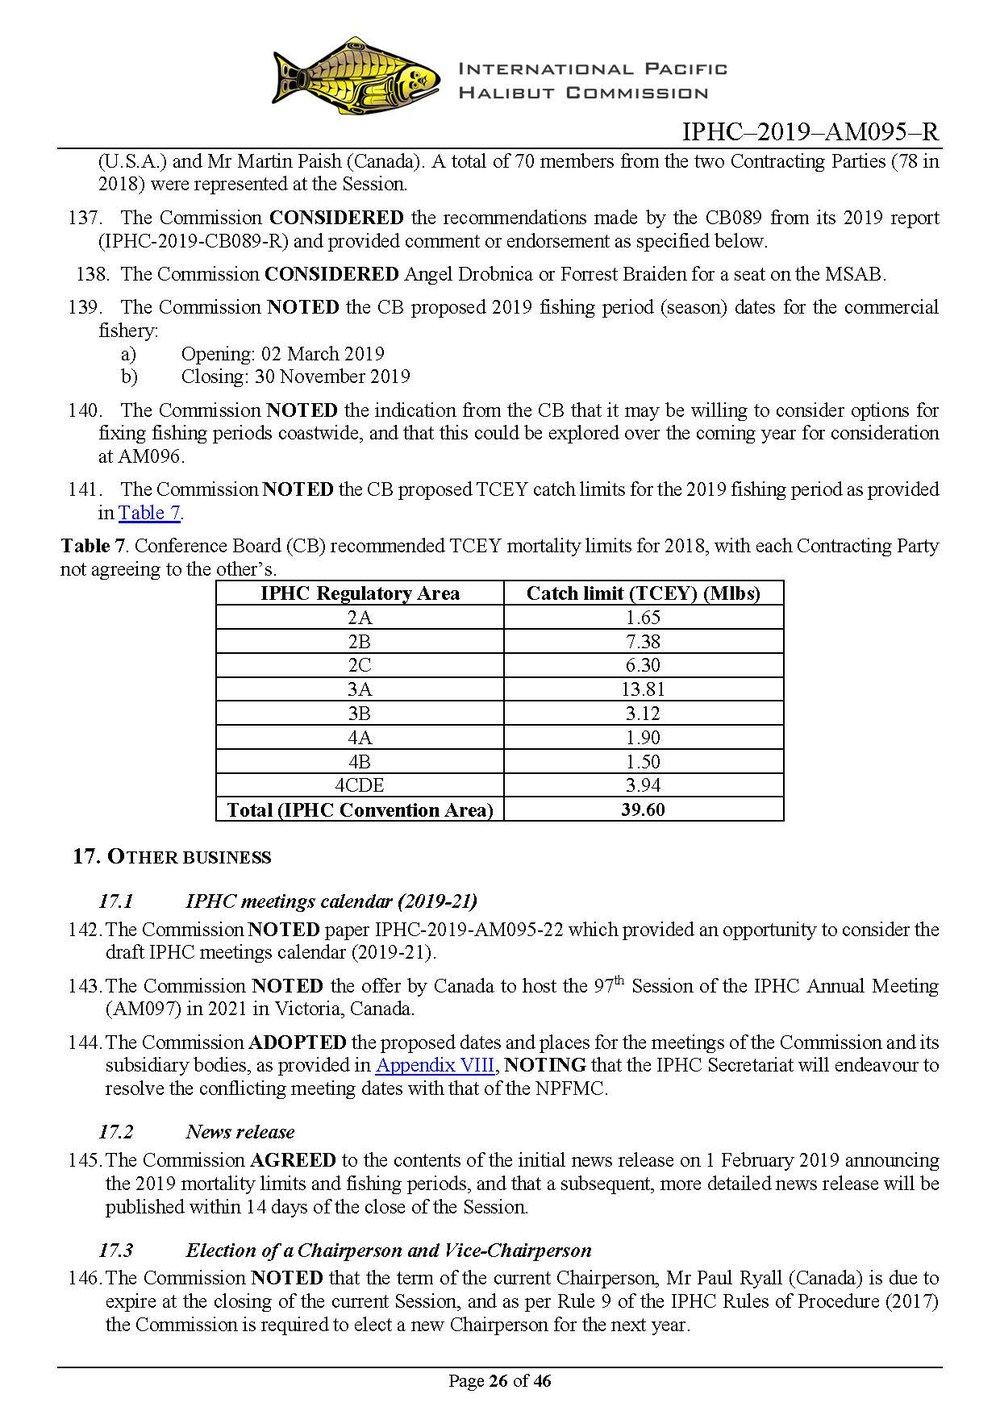 iphc-2019-am095-r_Page_26.jpg